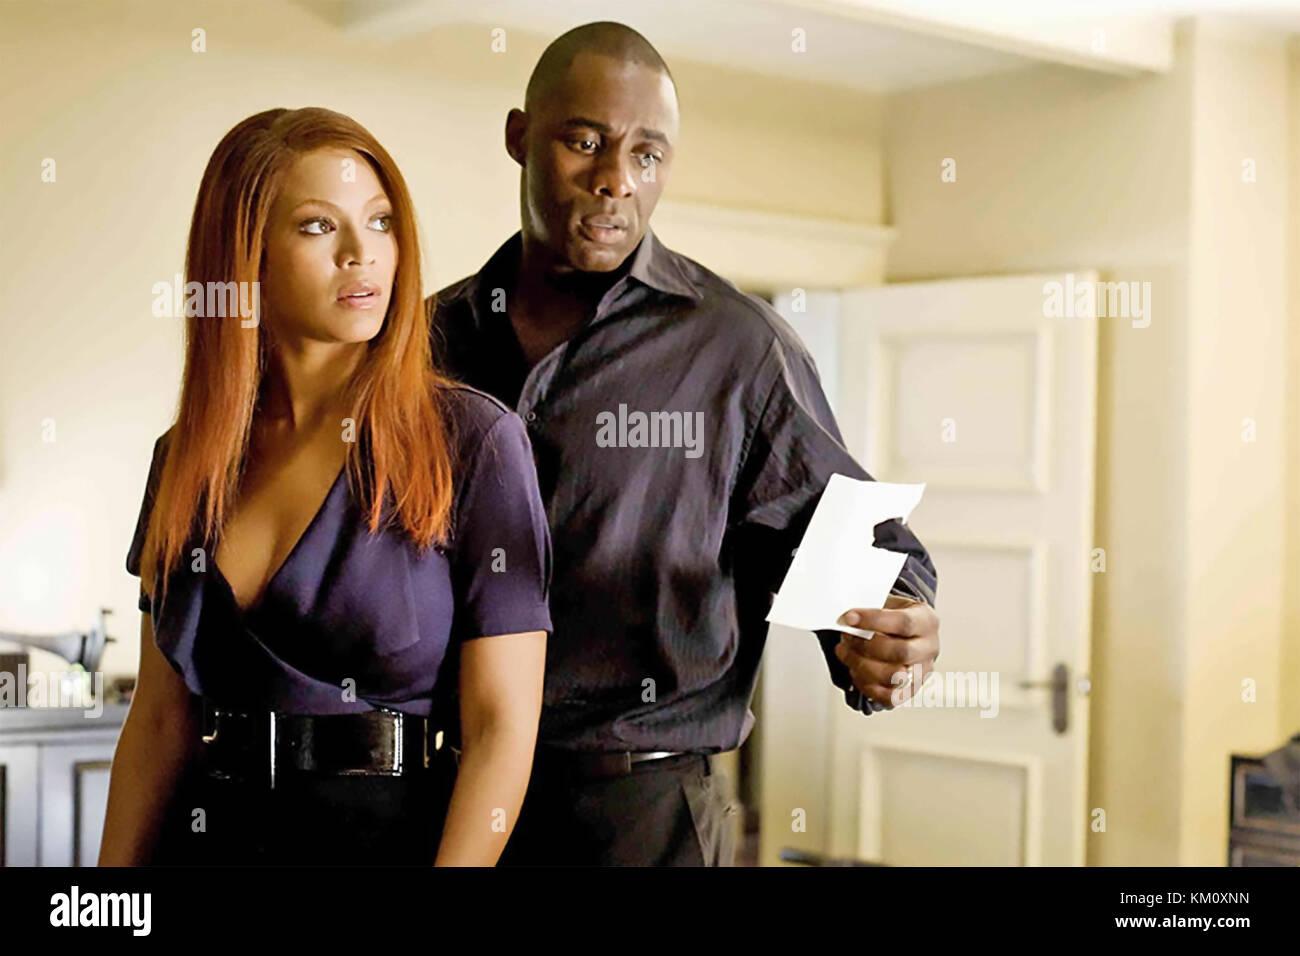 Obsédé 2009 screen gems film avec Beyonce et Idris elba Photo Stock